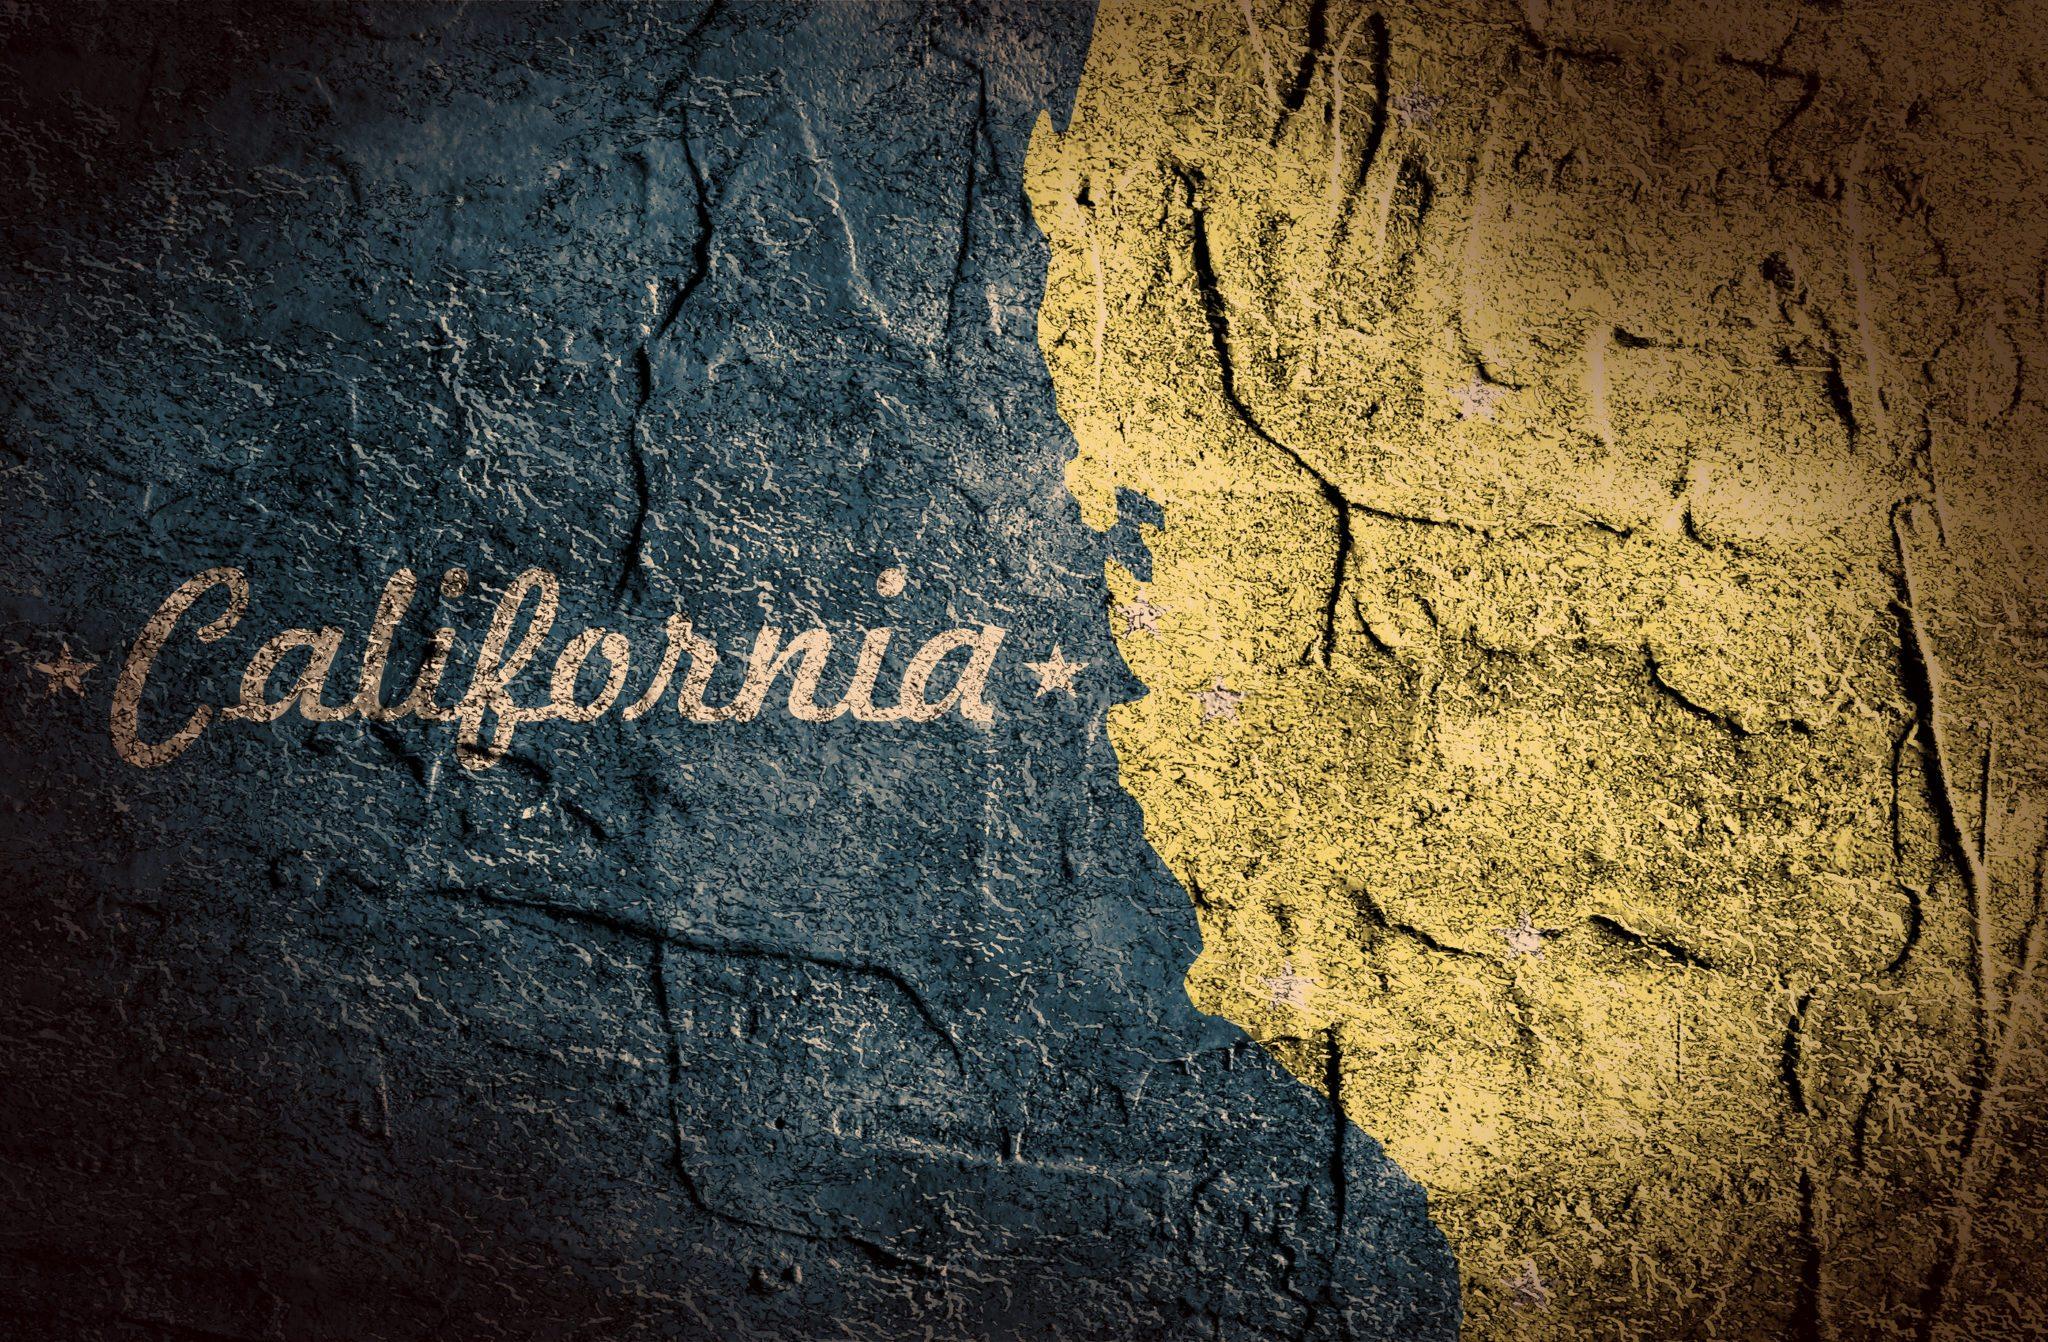 California Waterfowl Hunting License